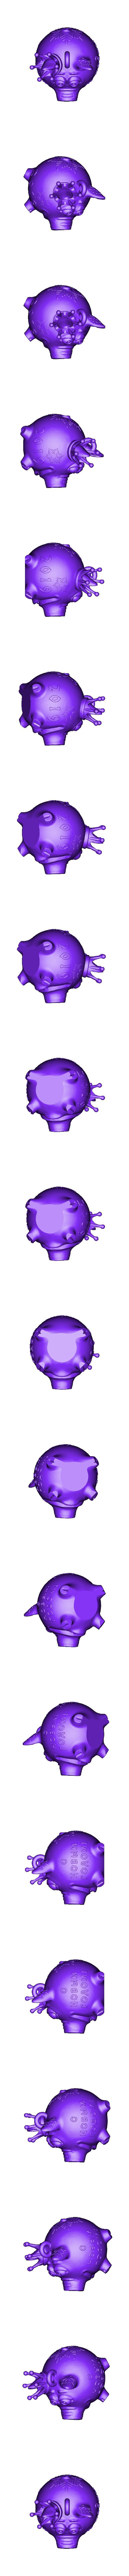 princes_N.stl Download free STL file Pig Royal Family • 3D printer model, shuranikishin